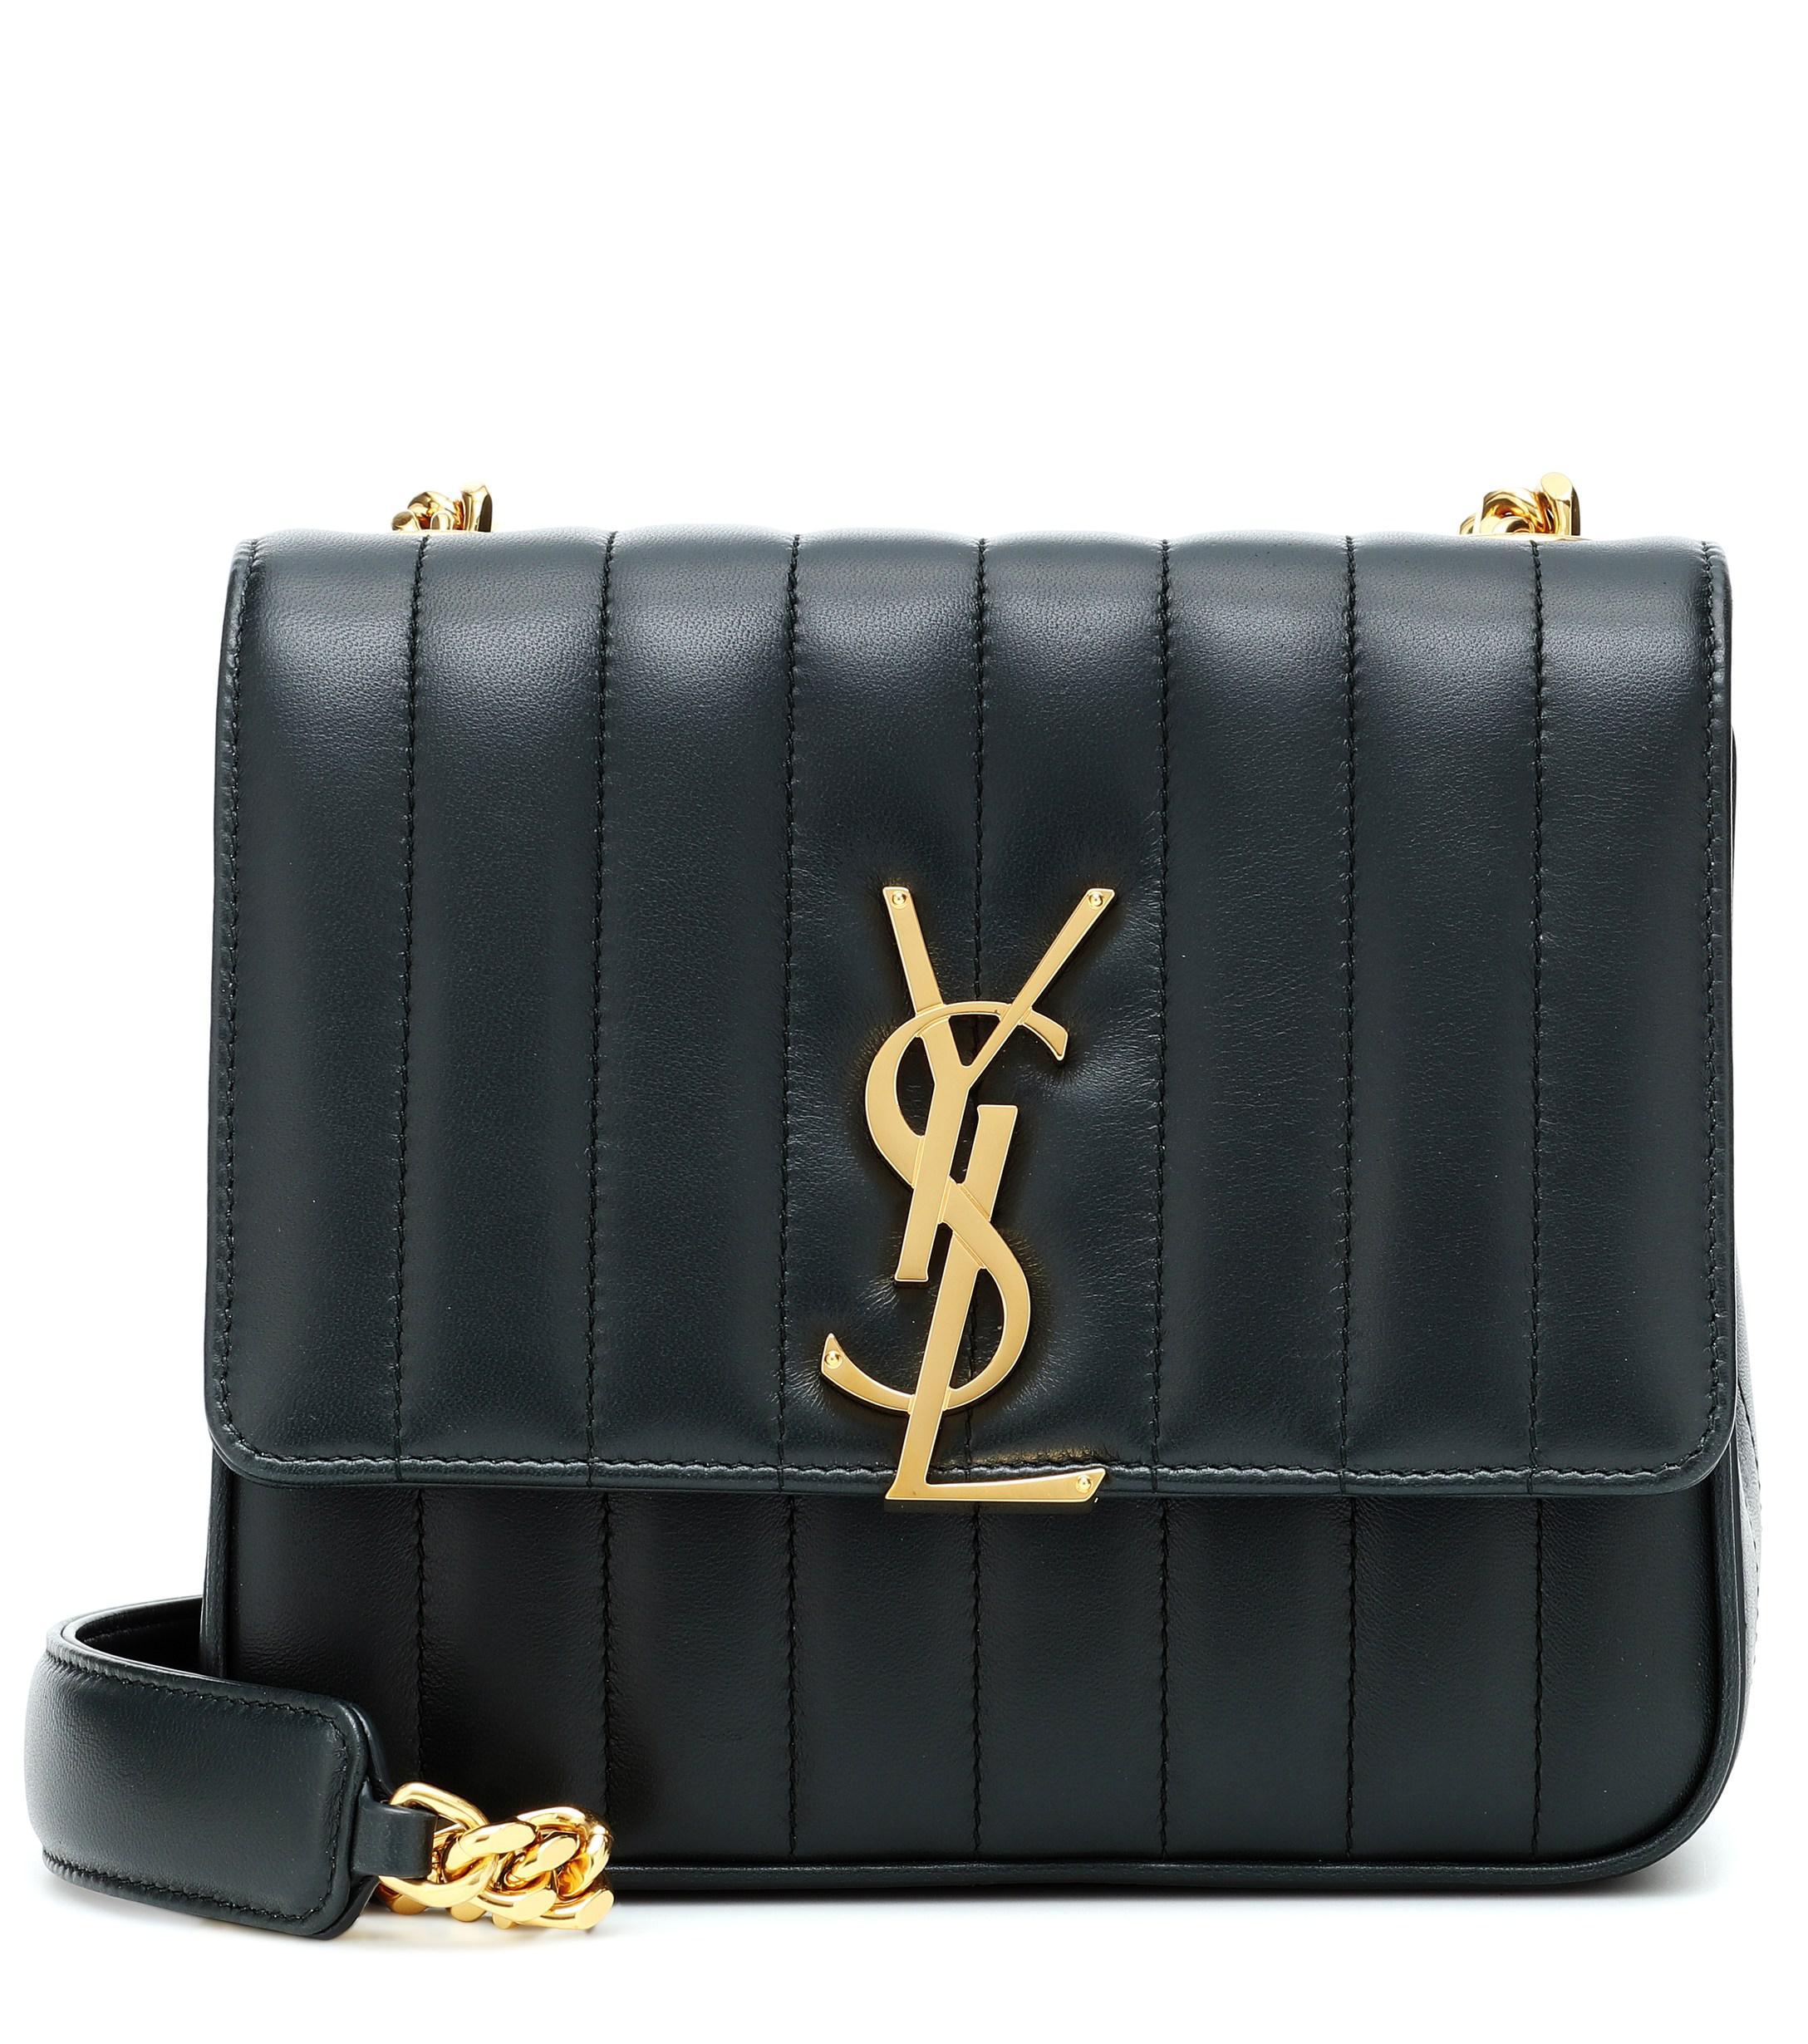 e73d2b44f4788 Lyst - Saint Laurent Vicky Medium Leather Shoulder Bag in Green